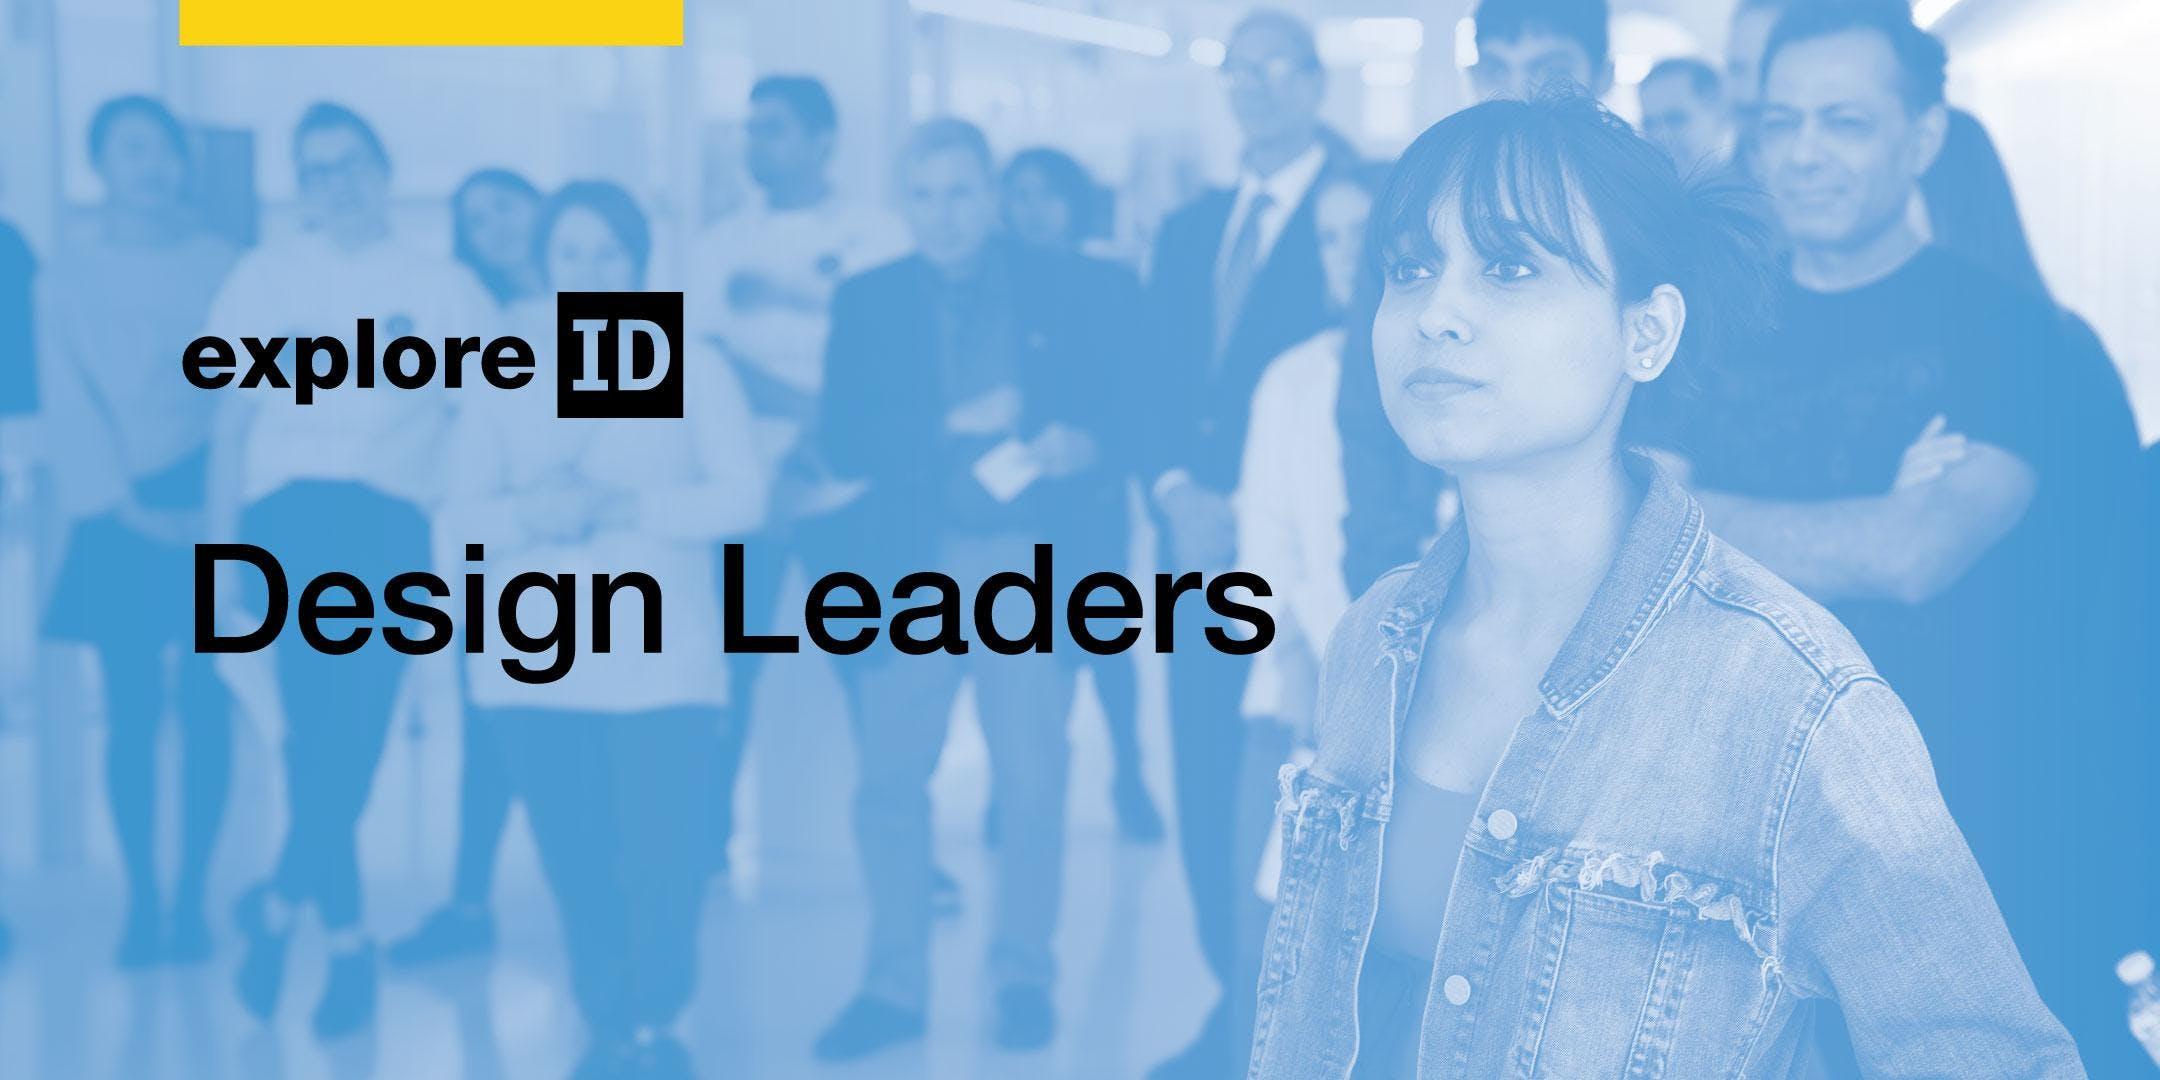 exploreID: Design Leaders